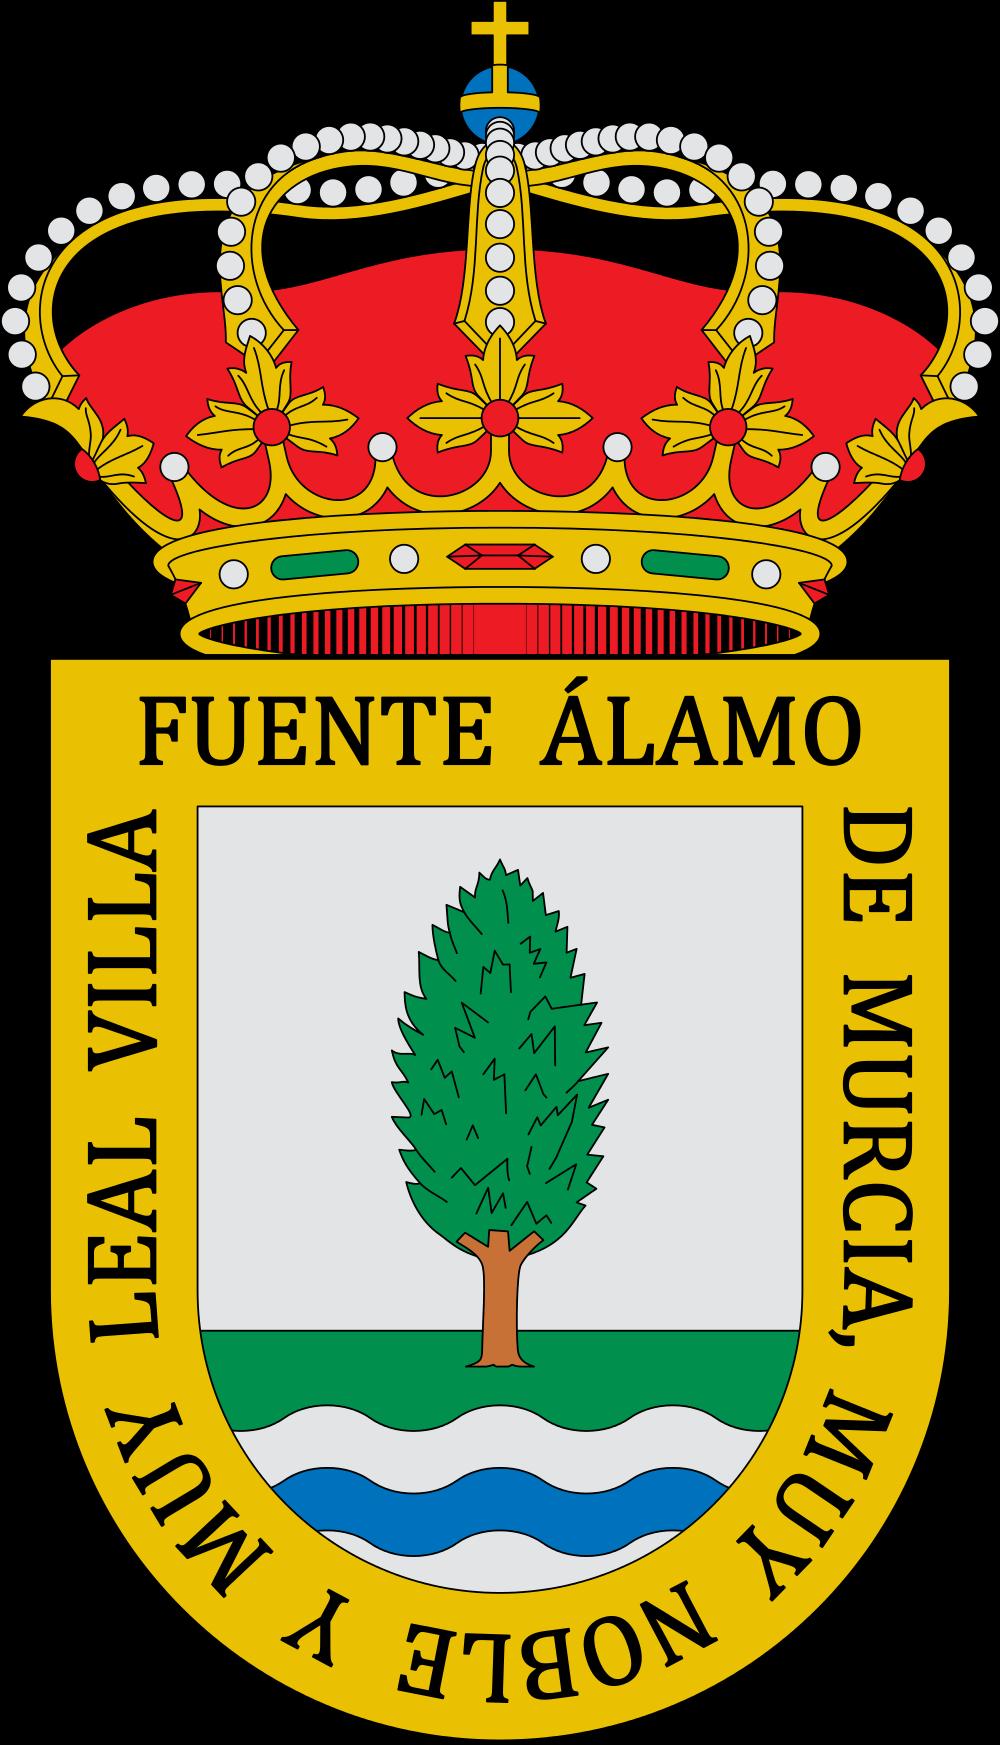 File:Escudo de Fuente Álamo de Murcia (Murcia).svg.